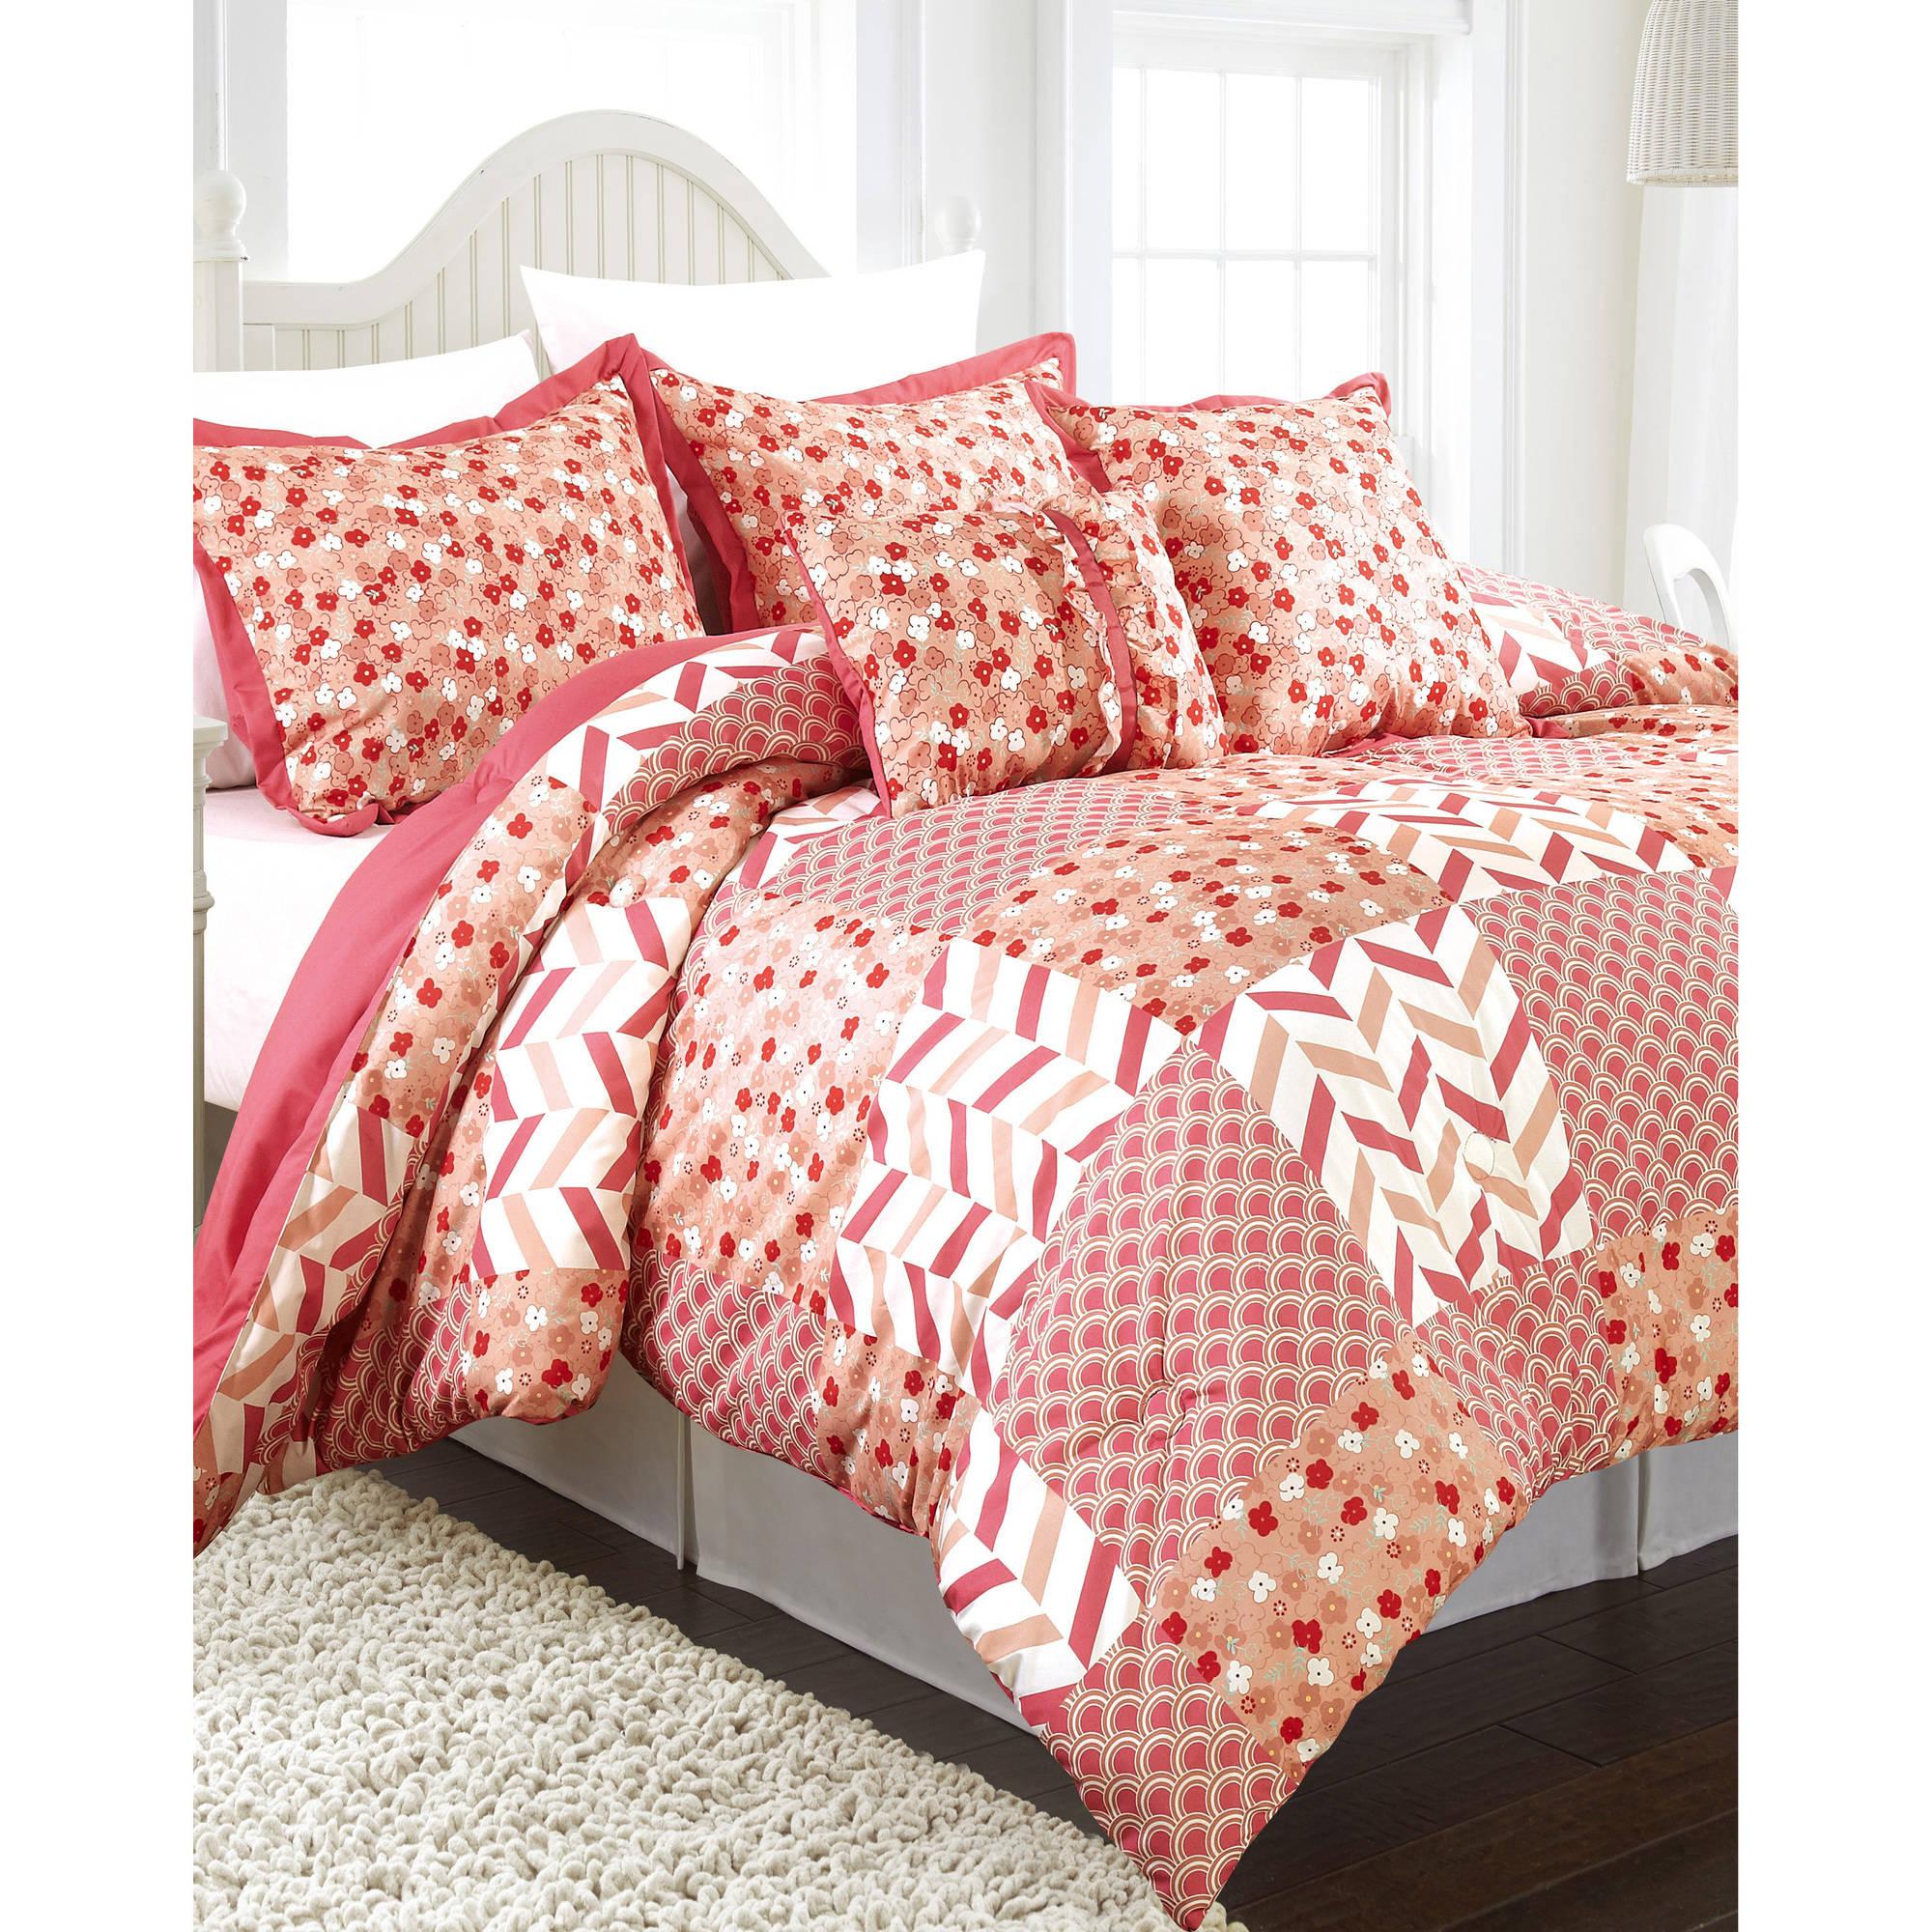 Piper 5-Piece Bedding Comforter Set